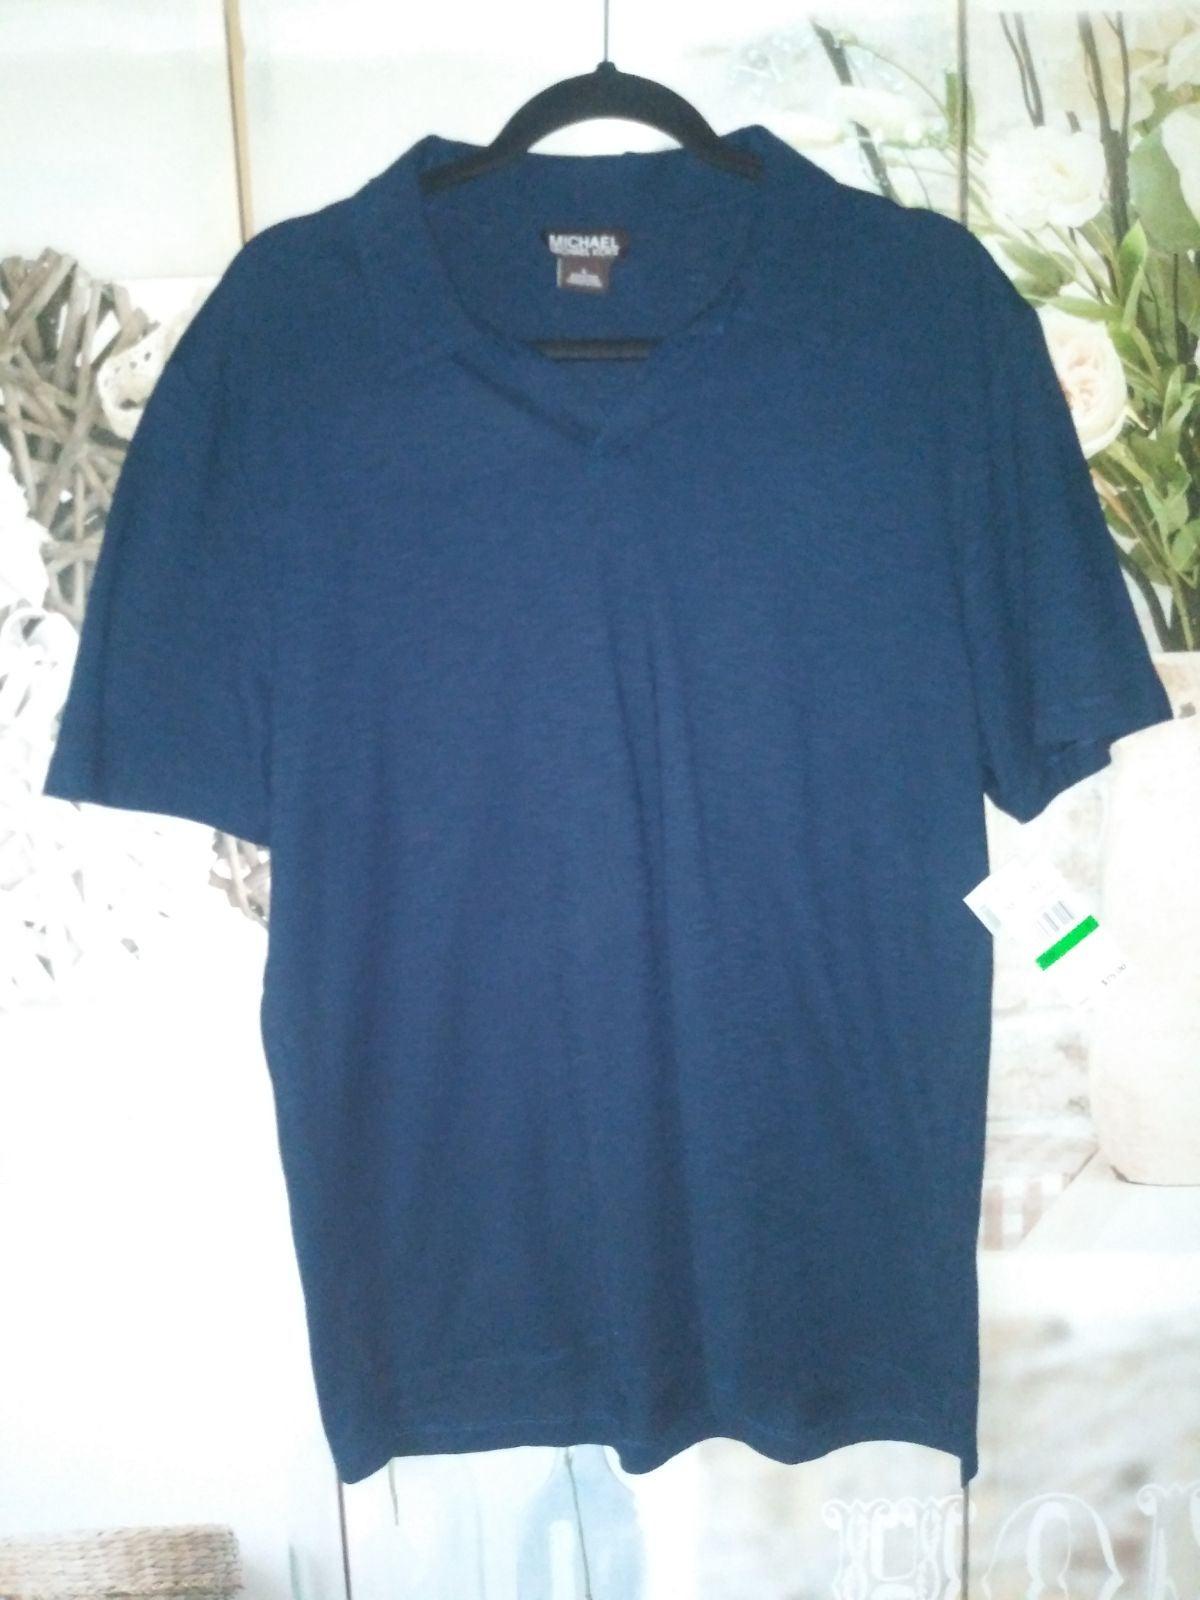 Micheal Kors Shirt Sz.L NWT